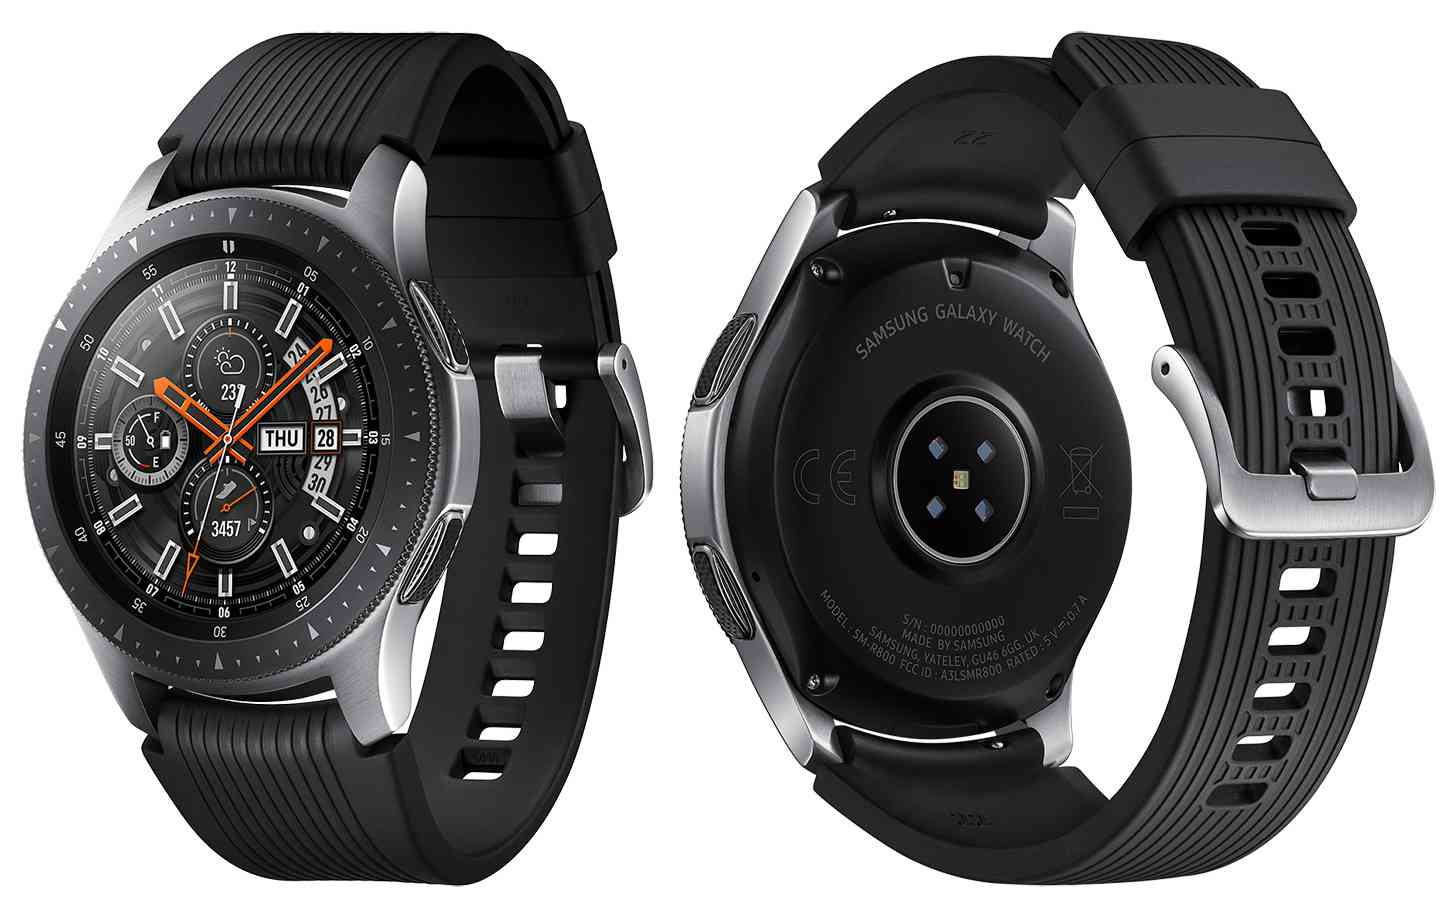 Samsung Galaxy Watch 46mm official